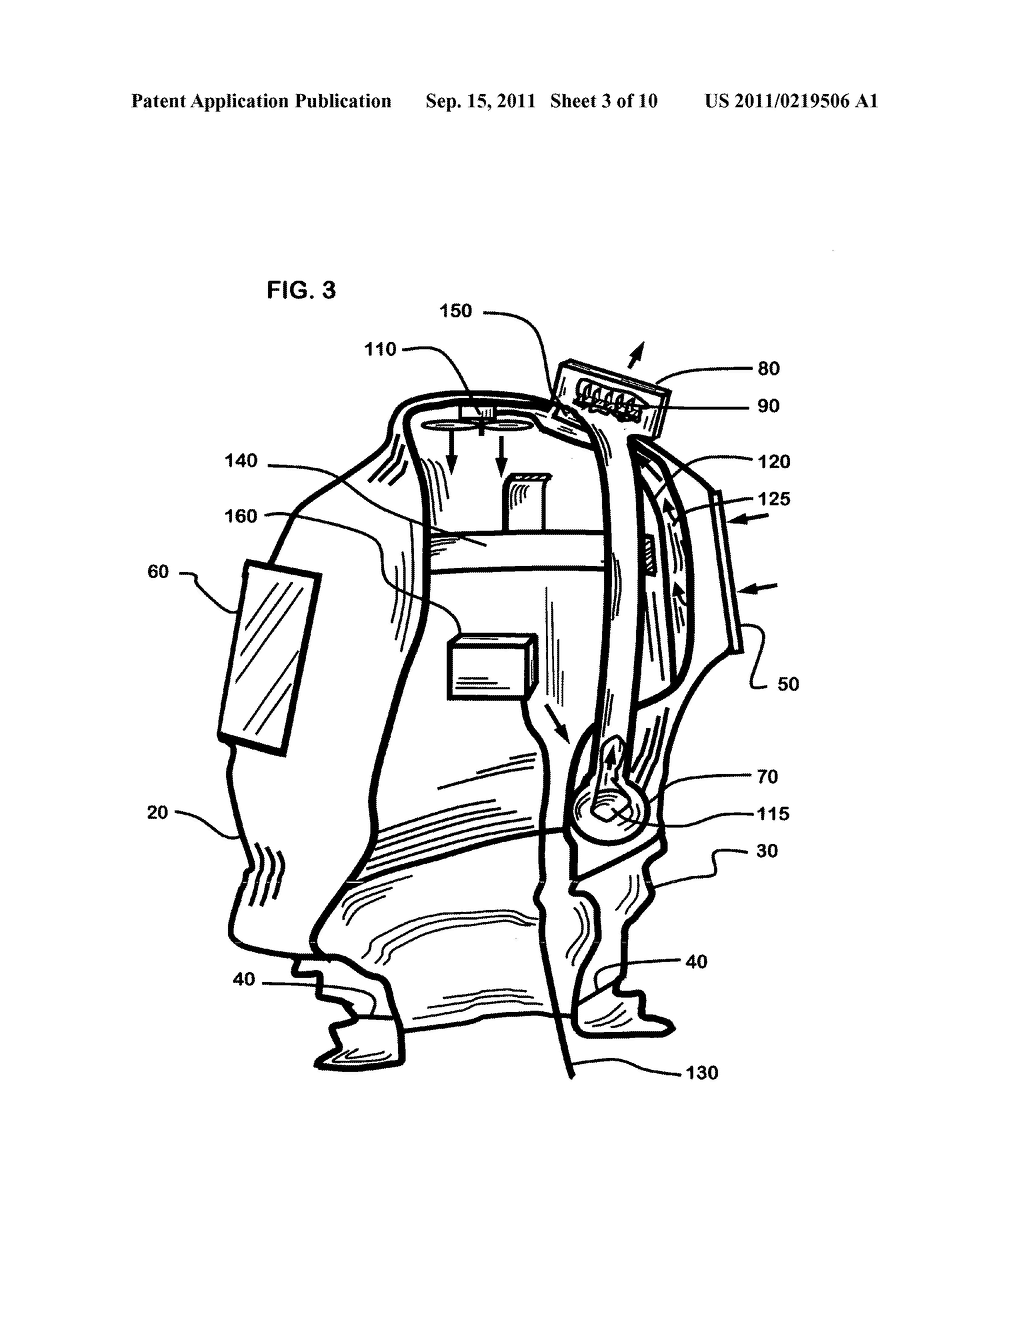 The Best Free Welding Drawing Images Download From 50 Drawings Underwater Diagram 1024x1320 Cool Clean Air Helmet